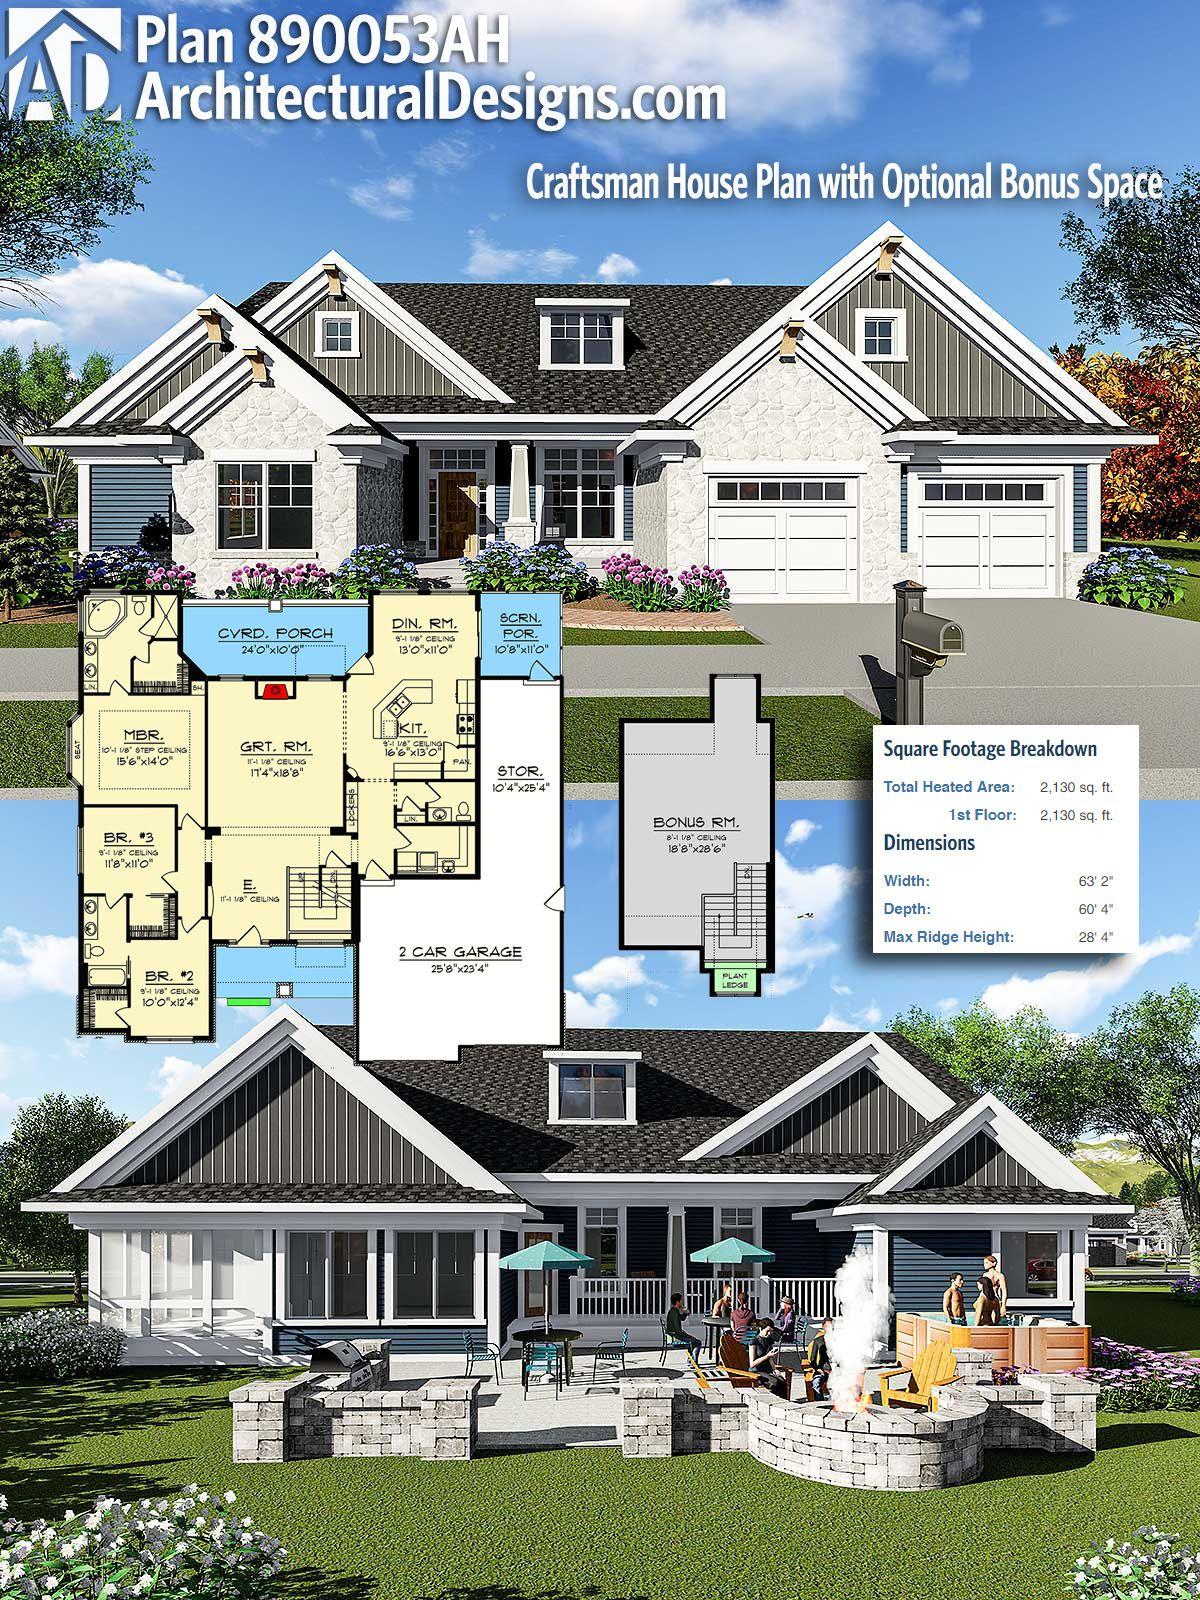 Plan 890053ah Craftsman House Plan With Optional Bonus Space Craftsman House Plans Craftsman House House Plans